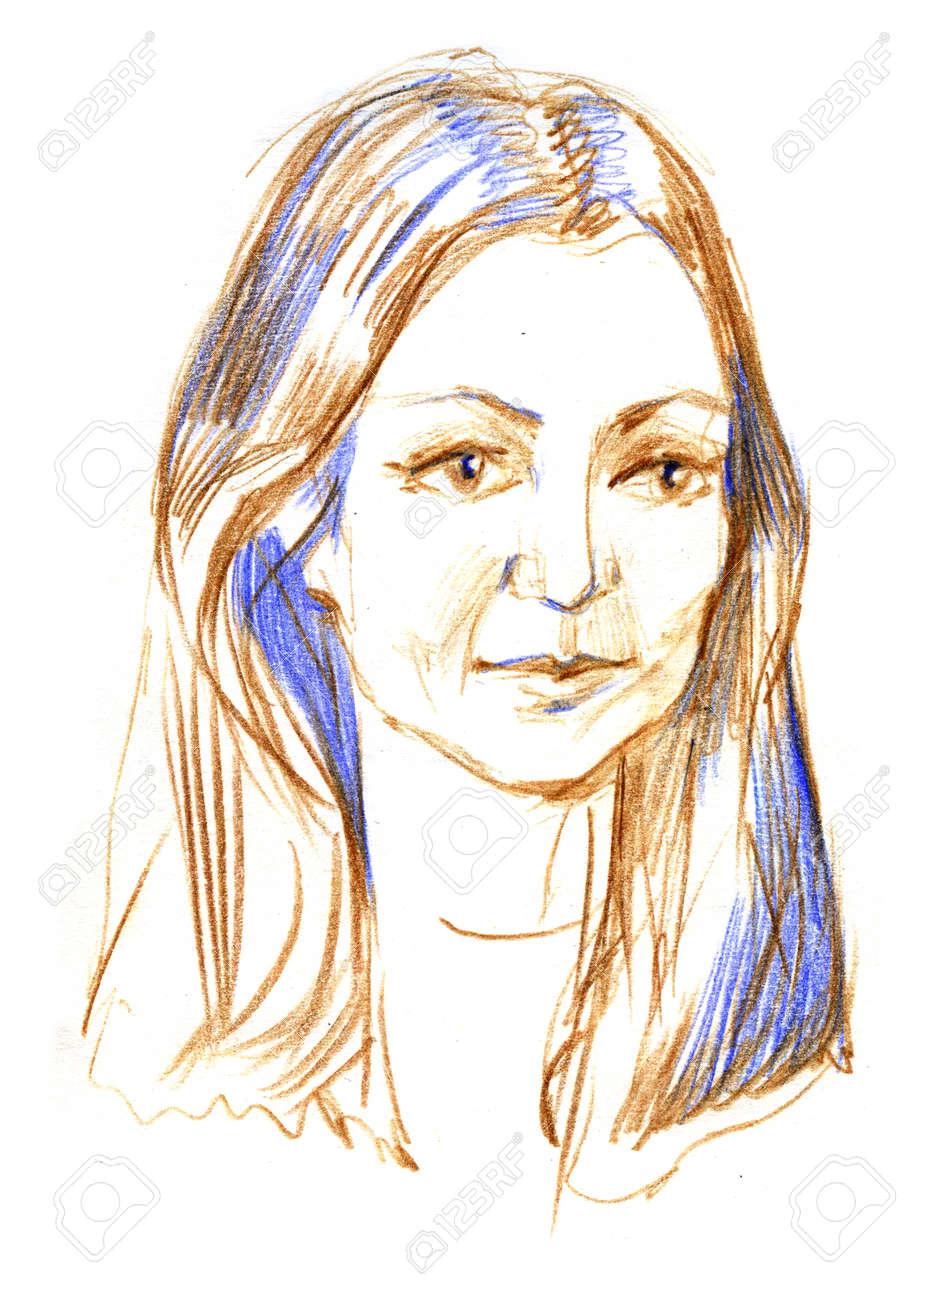 Pencil sketch of a woman s portrait stock photo 92941998